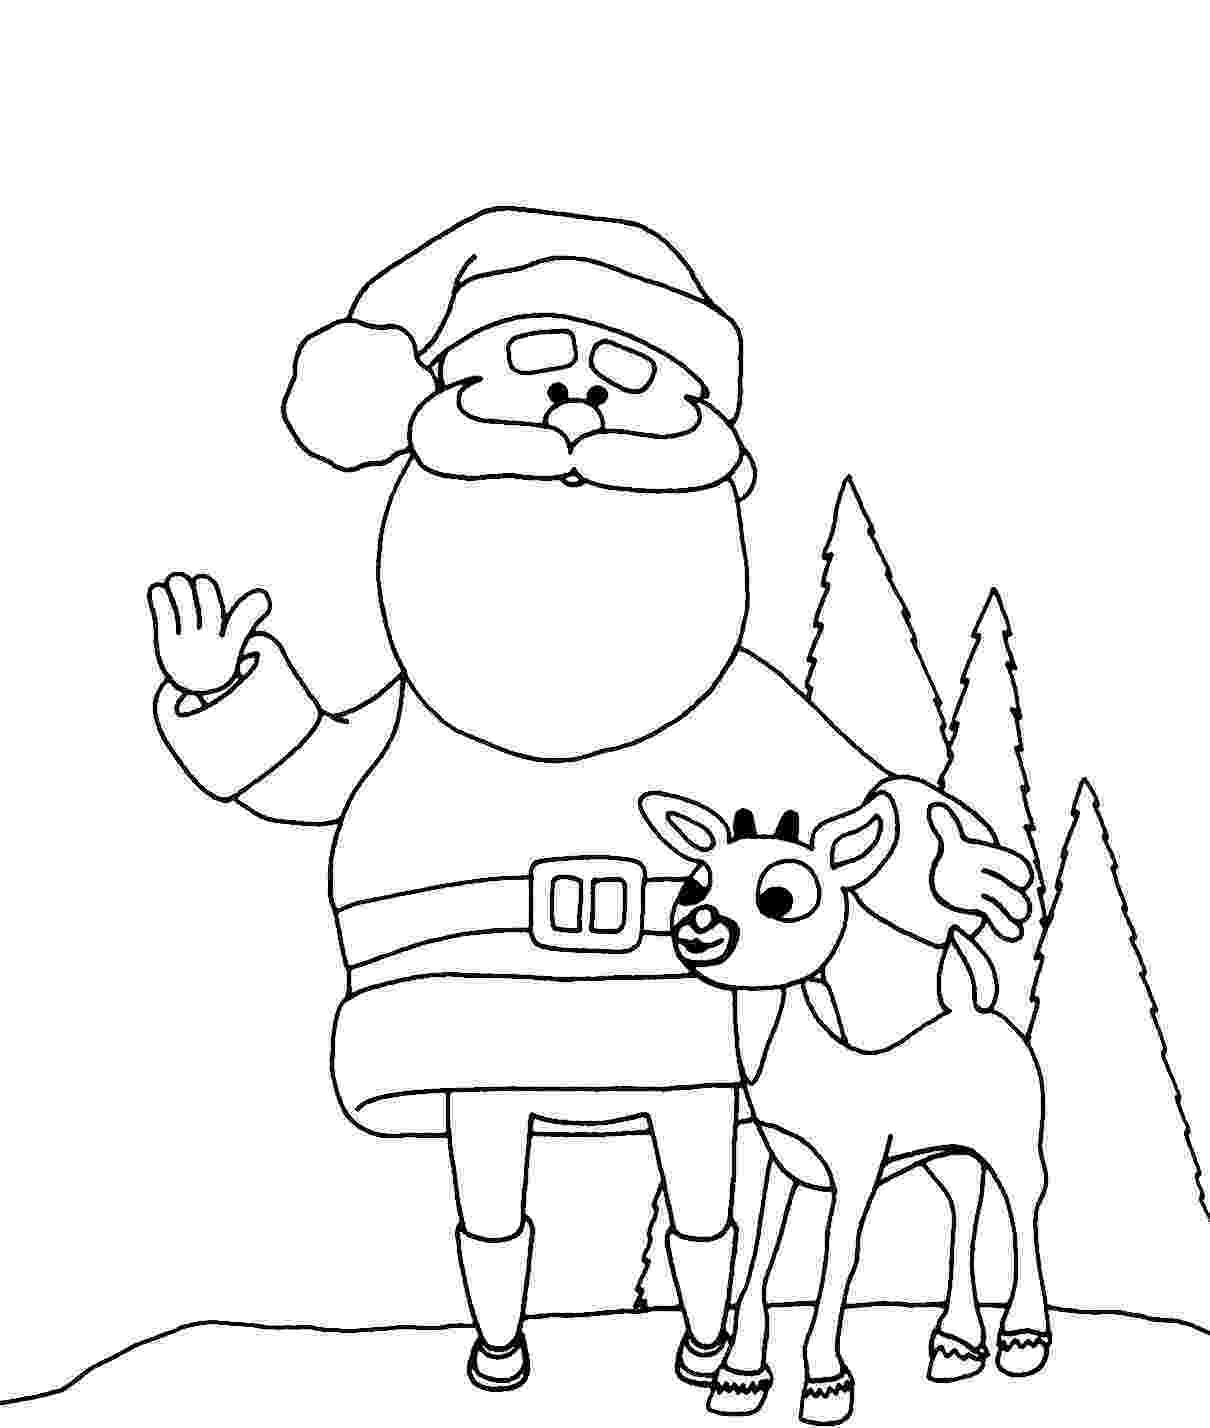 printable christmas coloring pages for kindergarten free printable preschool coloring pages best coloring kindergarten for coloring pages printable christmas